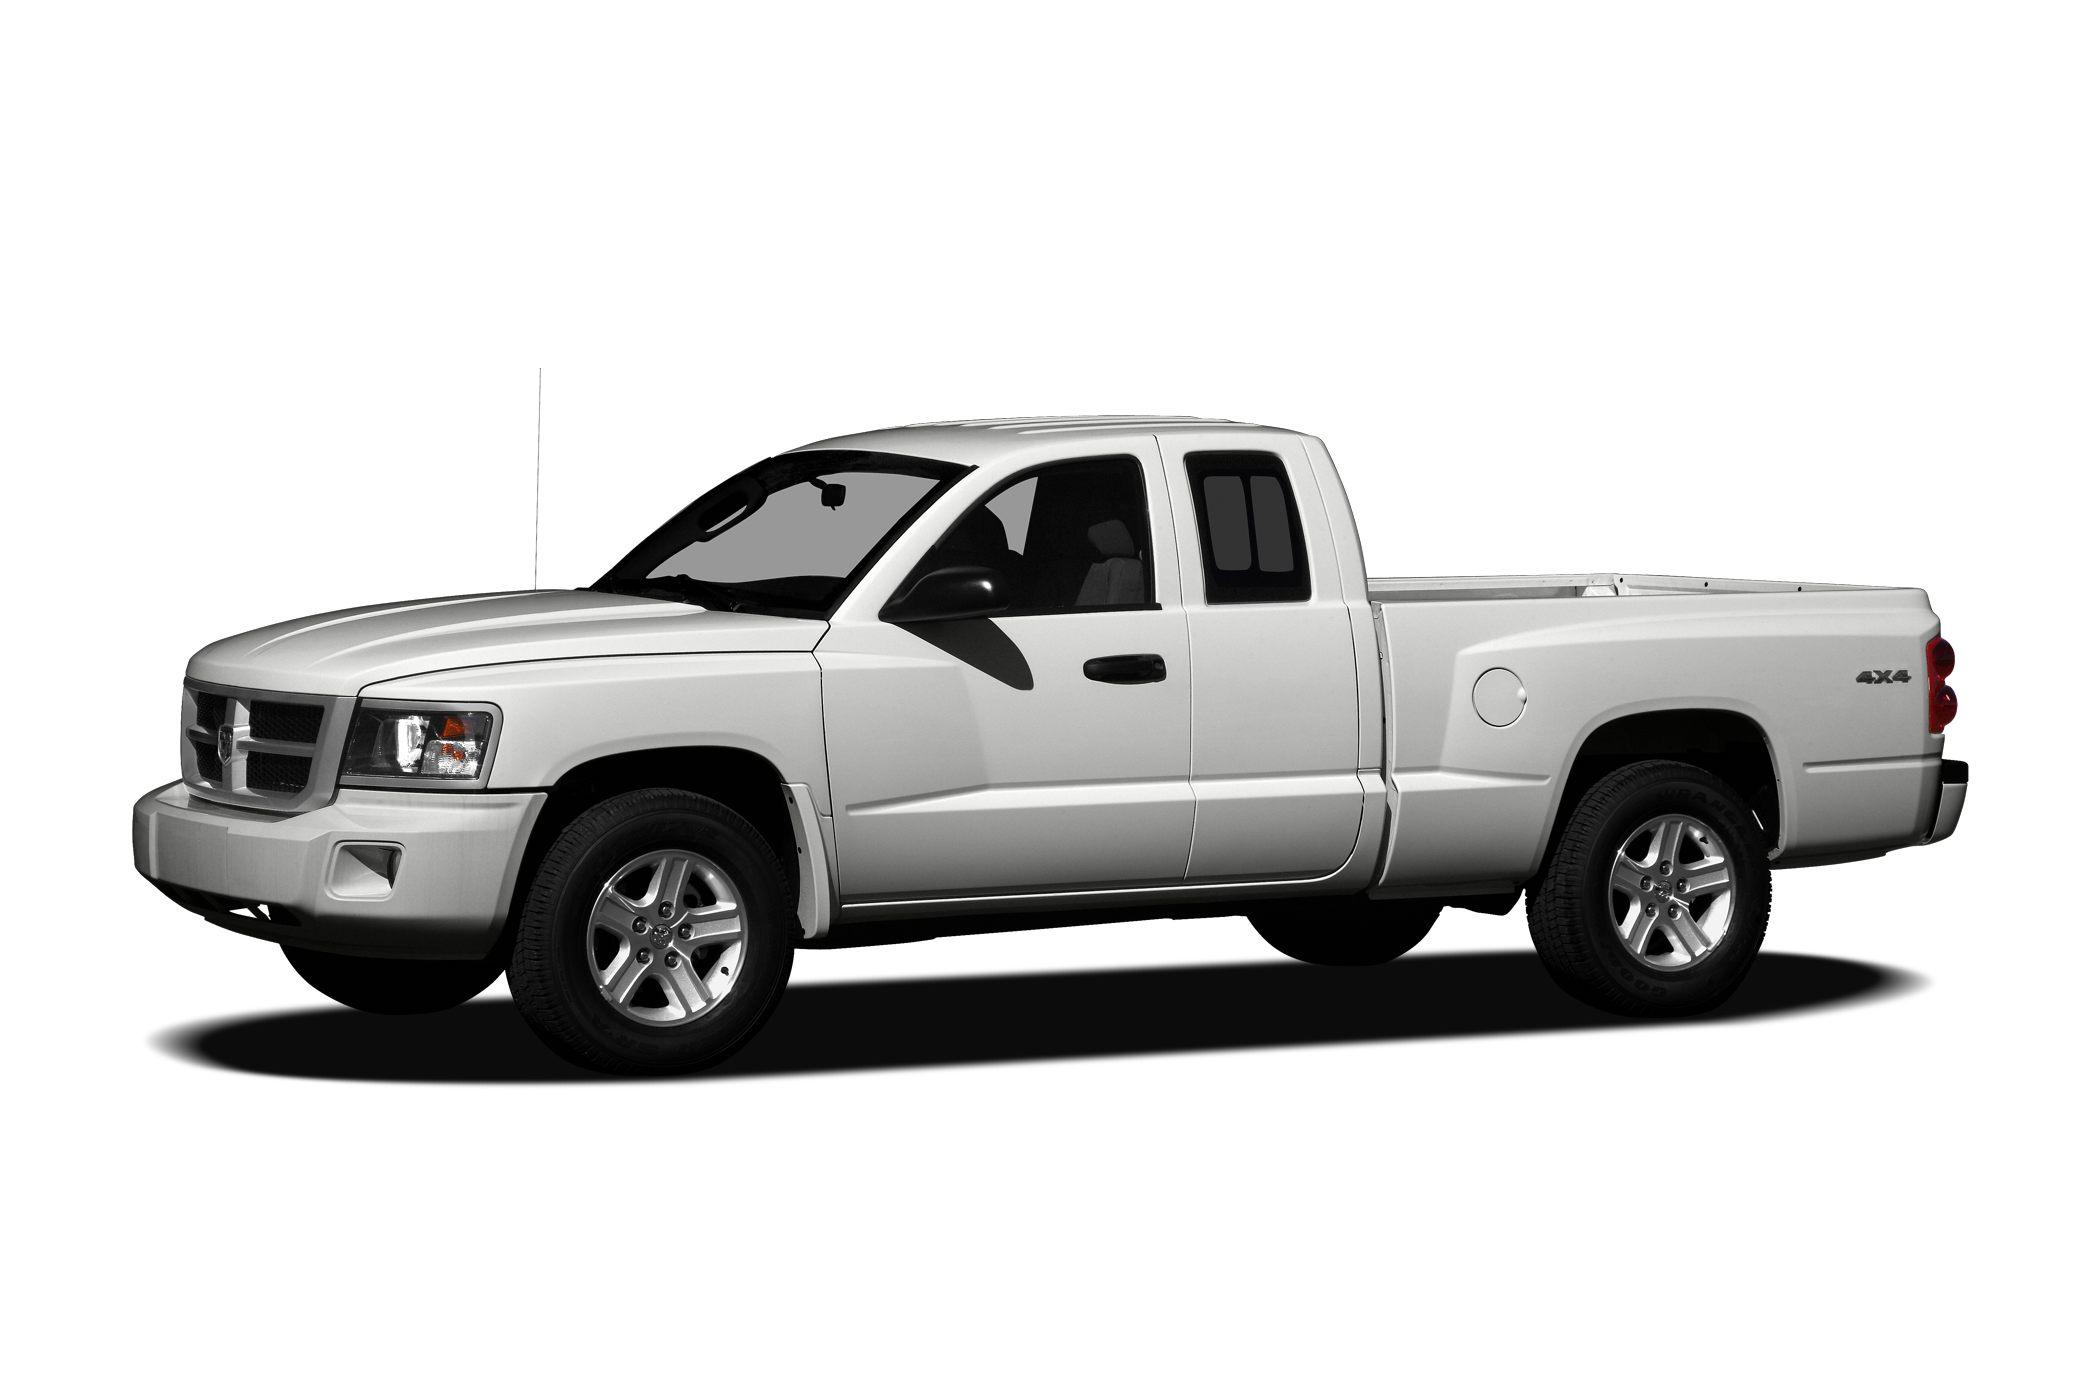 2008 Dodge Dakota SLT Miles 67779Color White Stock 16F09A VIN 1D7HE42K58S638325